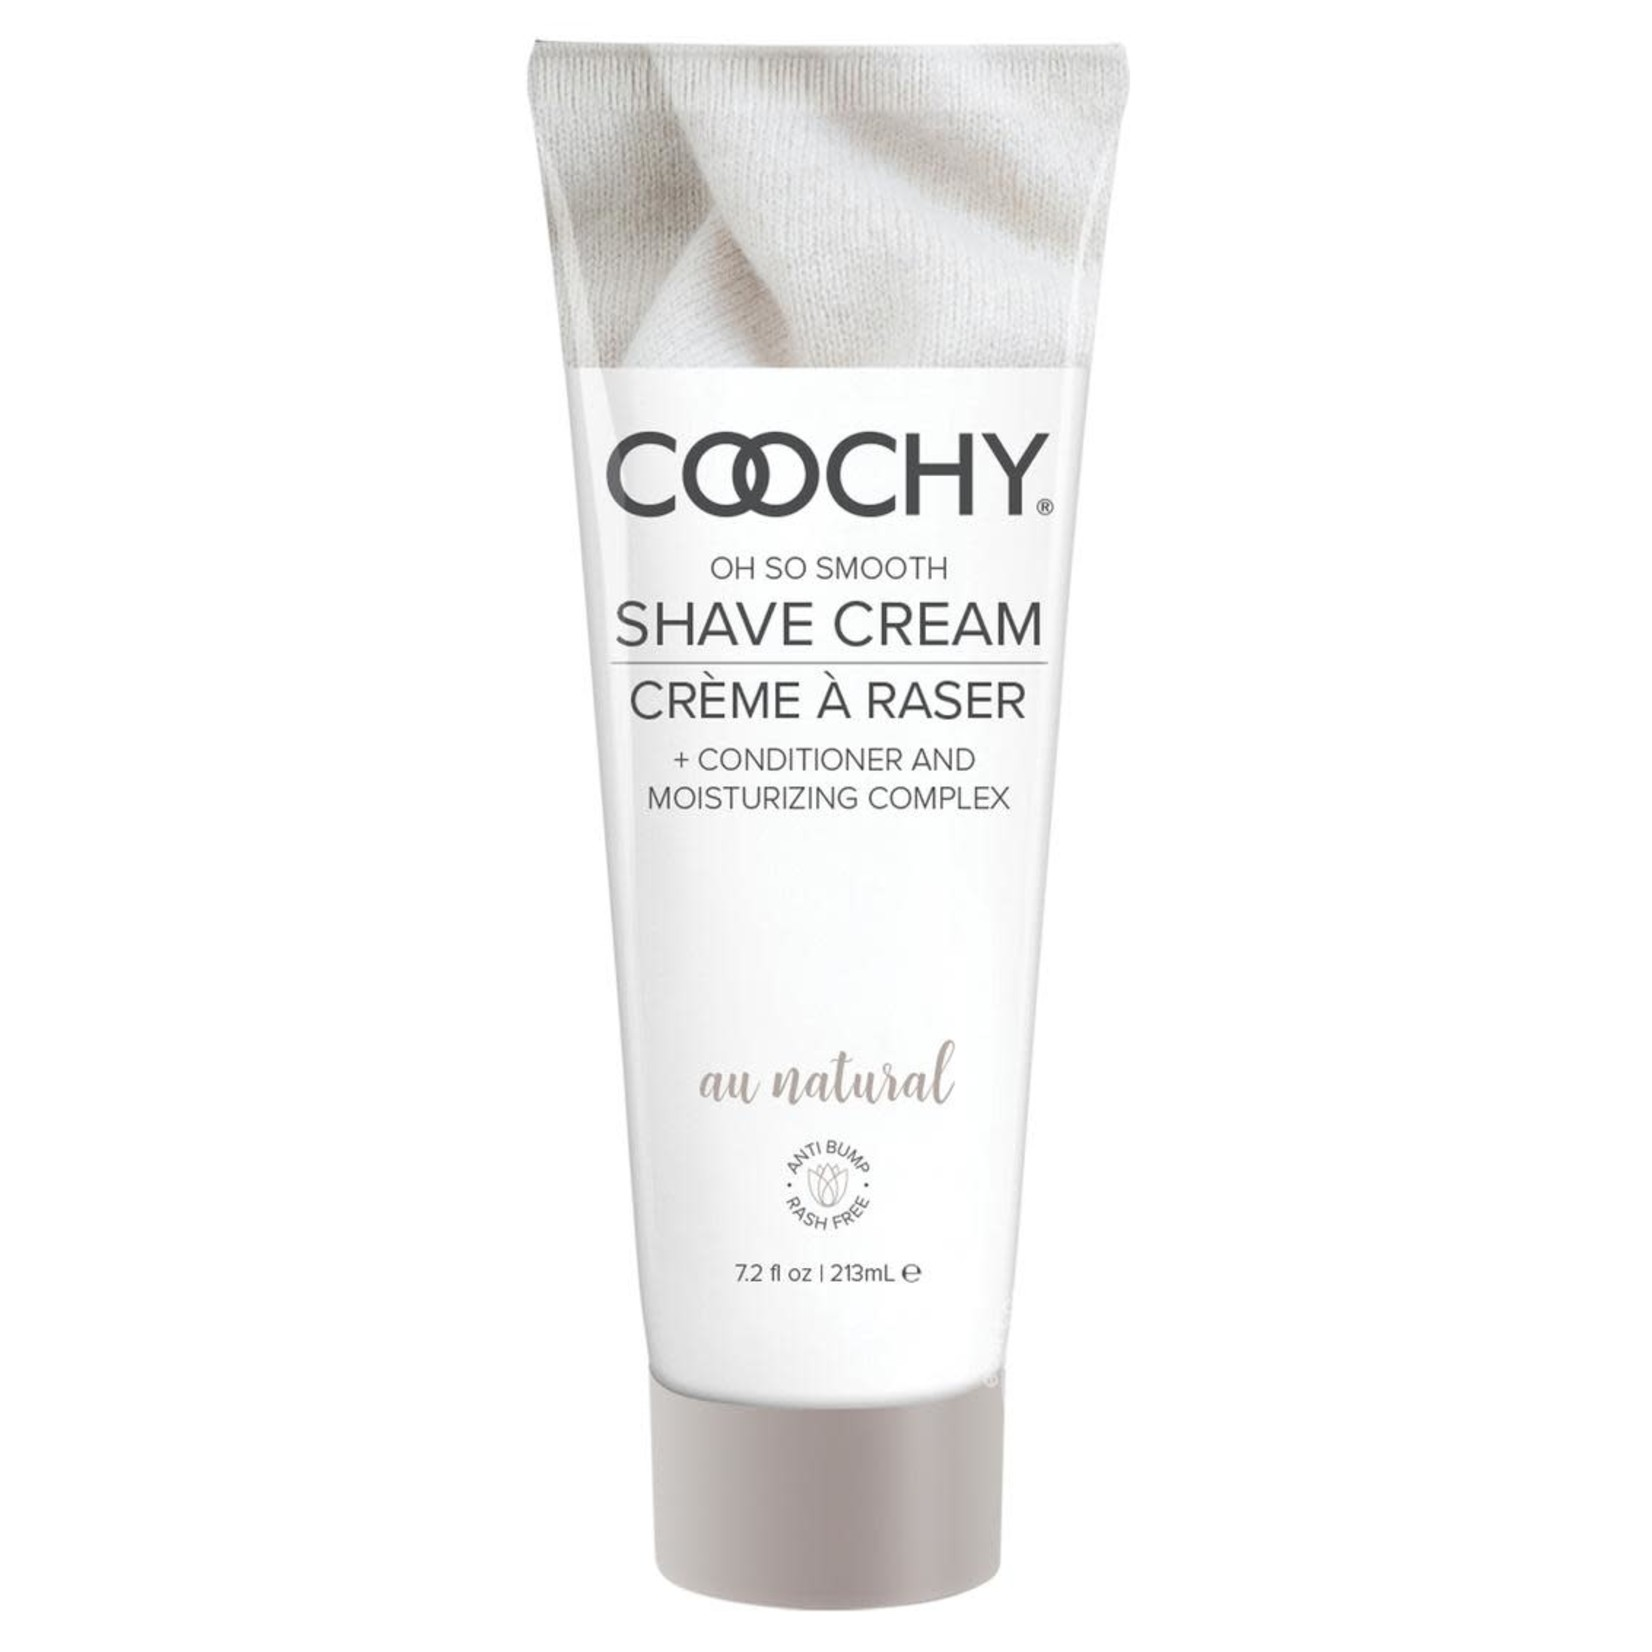 Coochy Shave Cream Au Natural 7.2oz